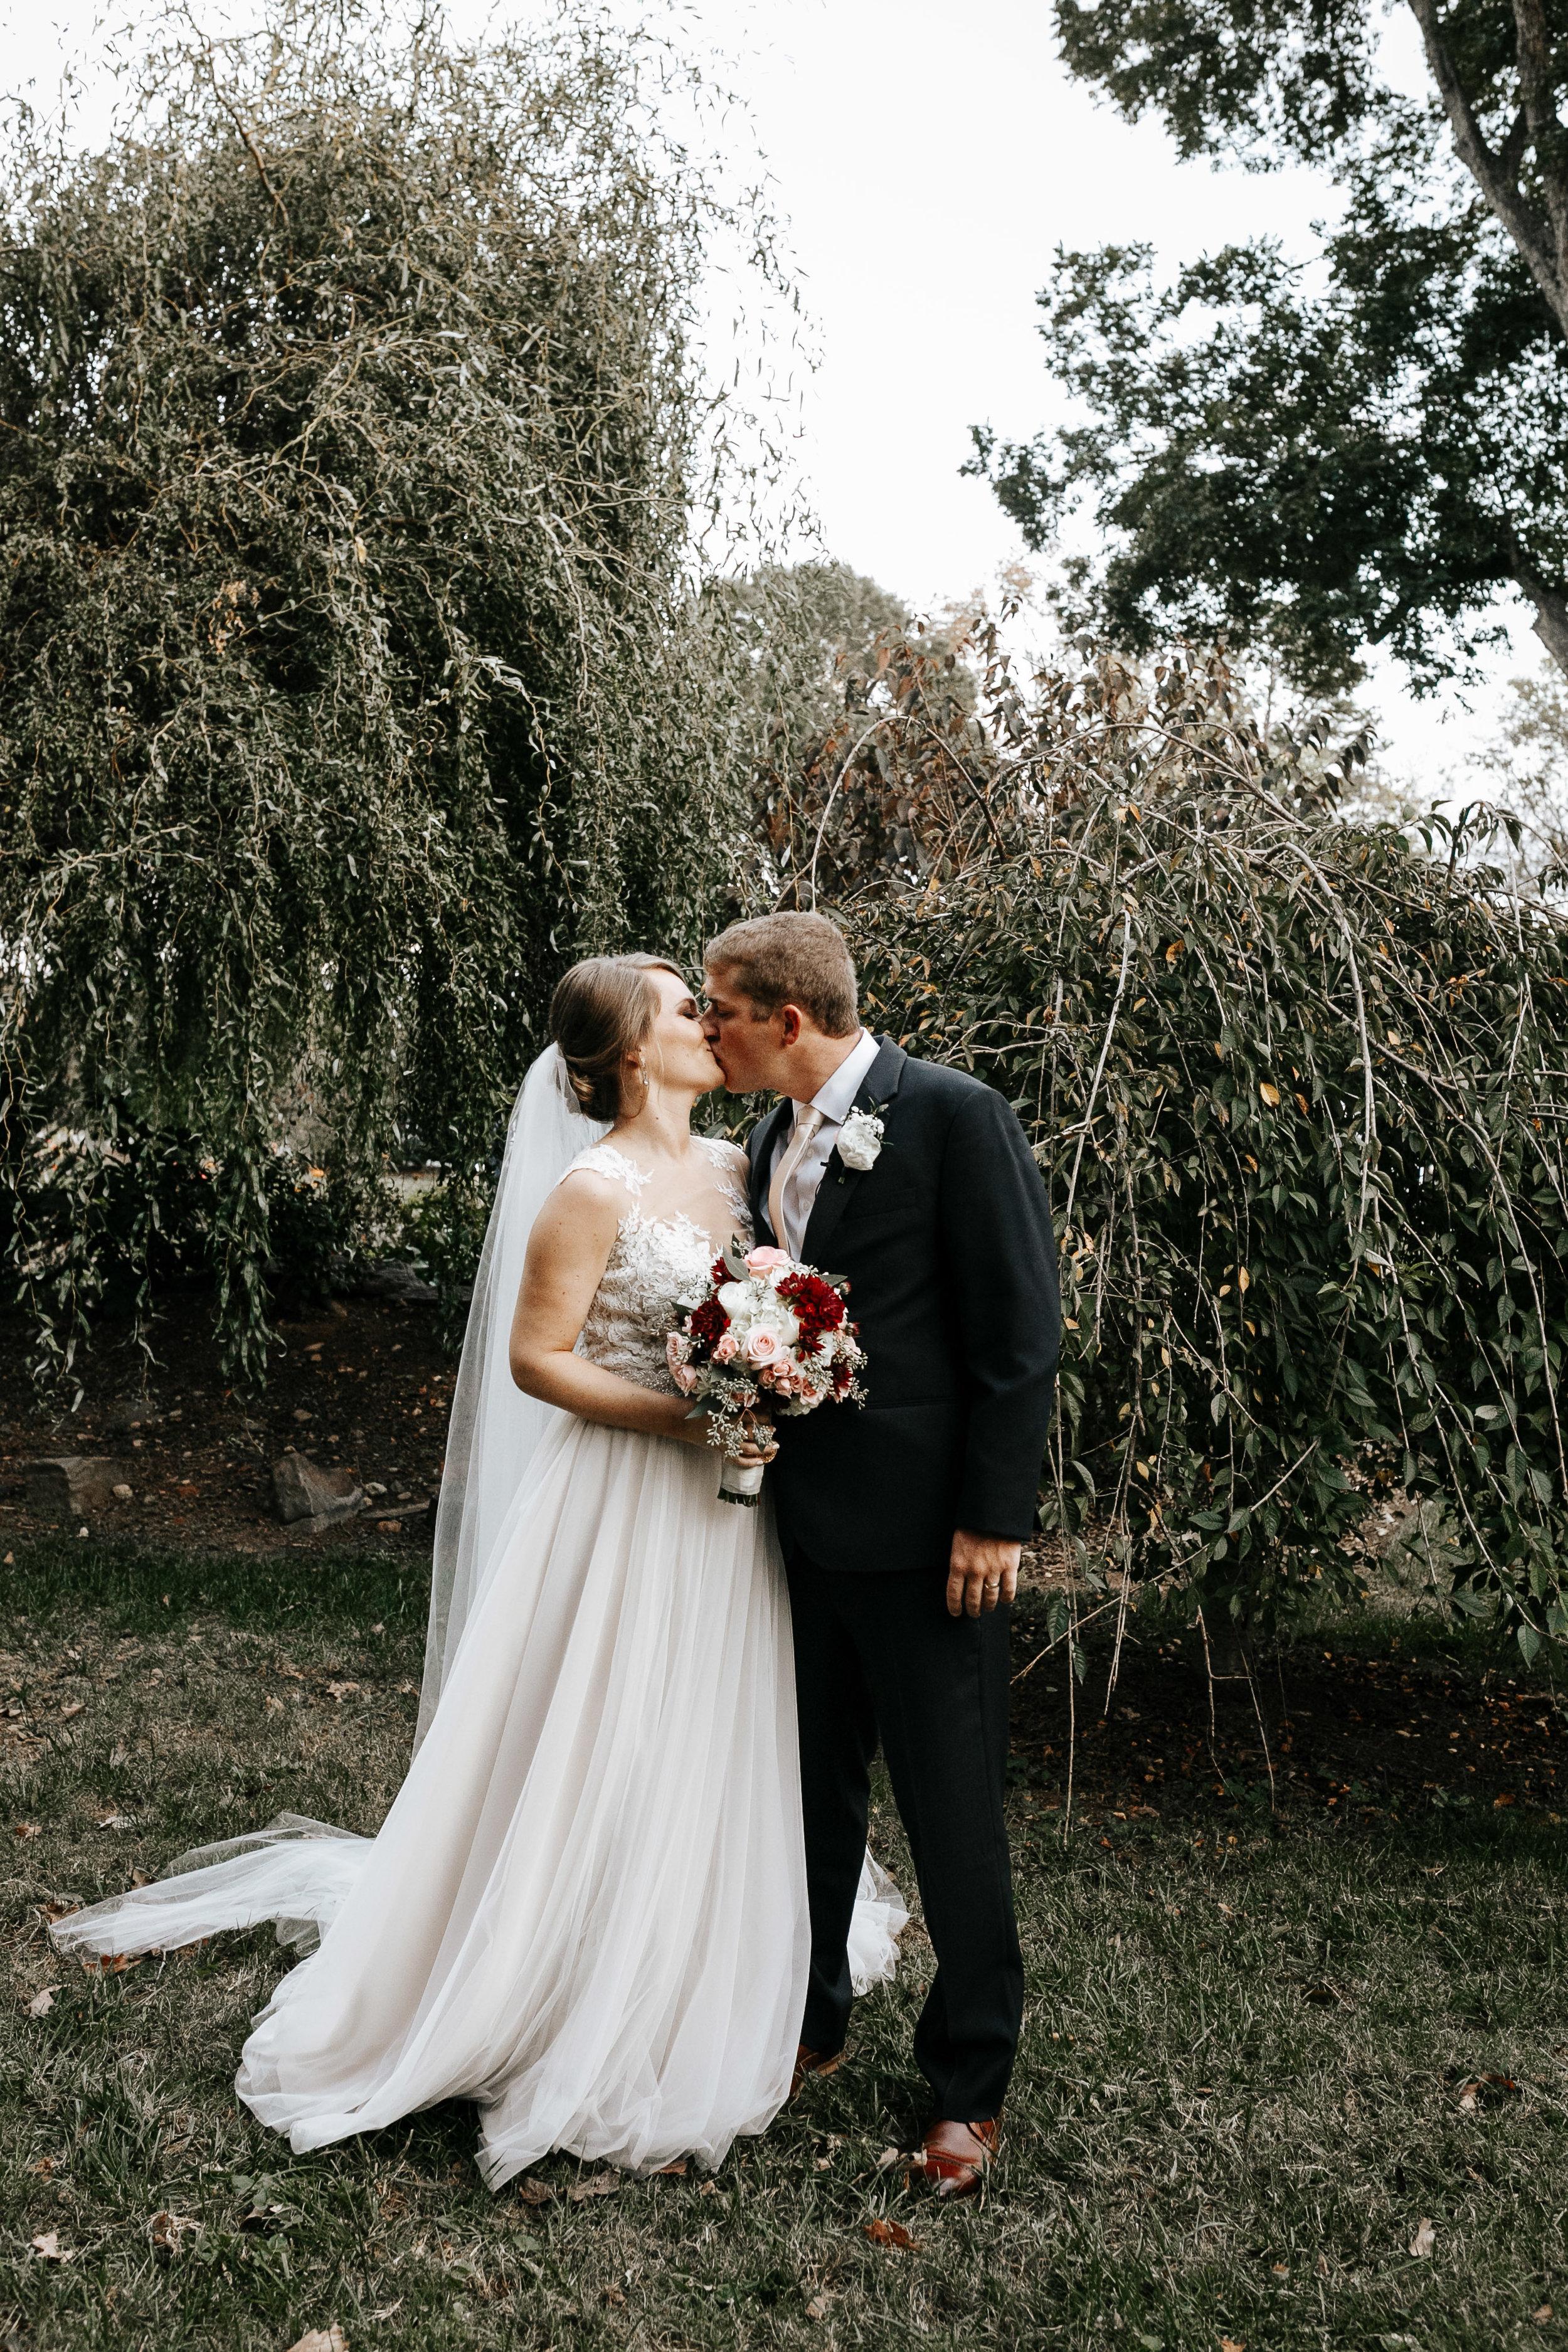 jessicabrandonwedding-44.jpg